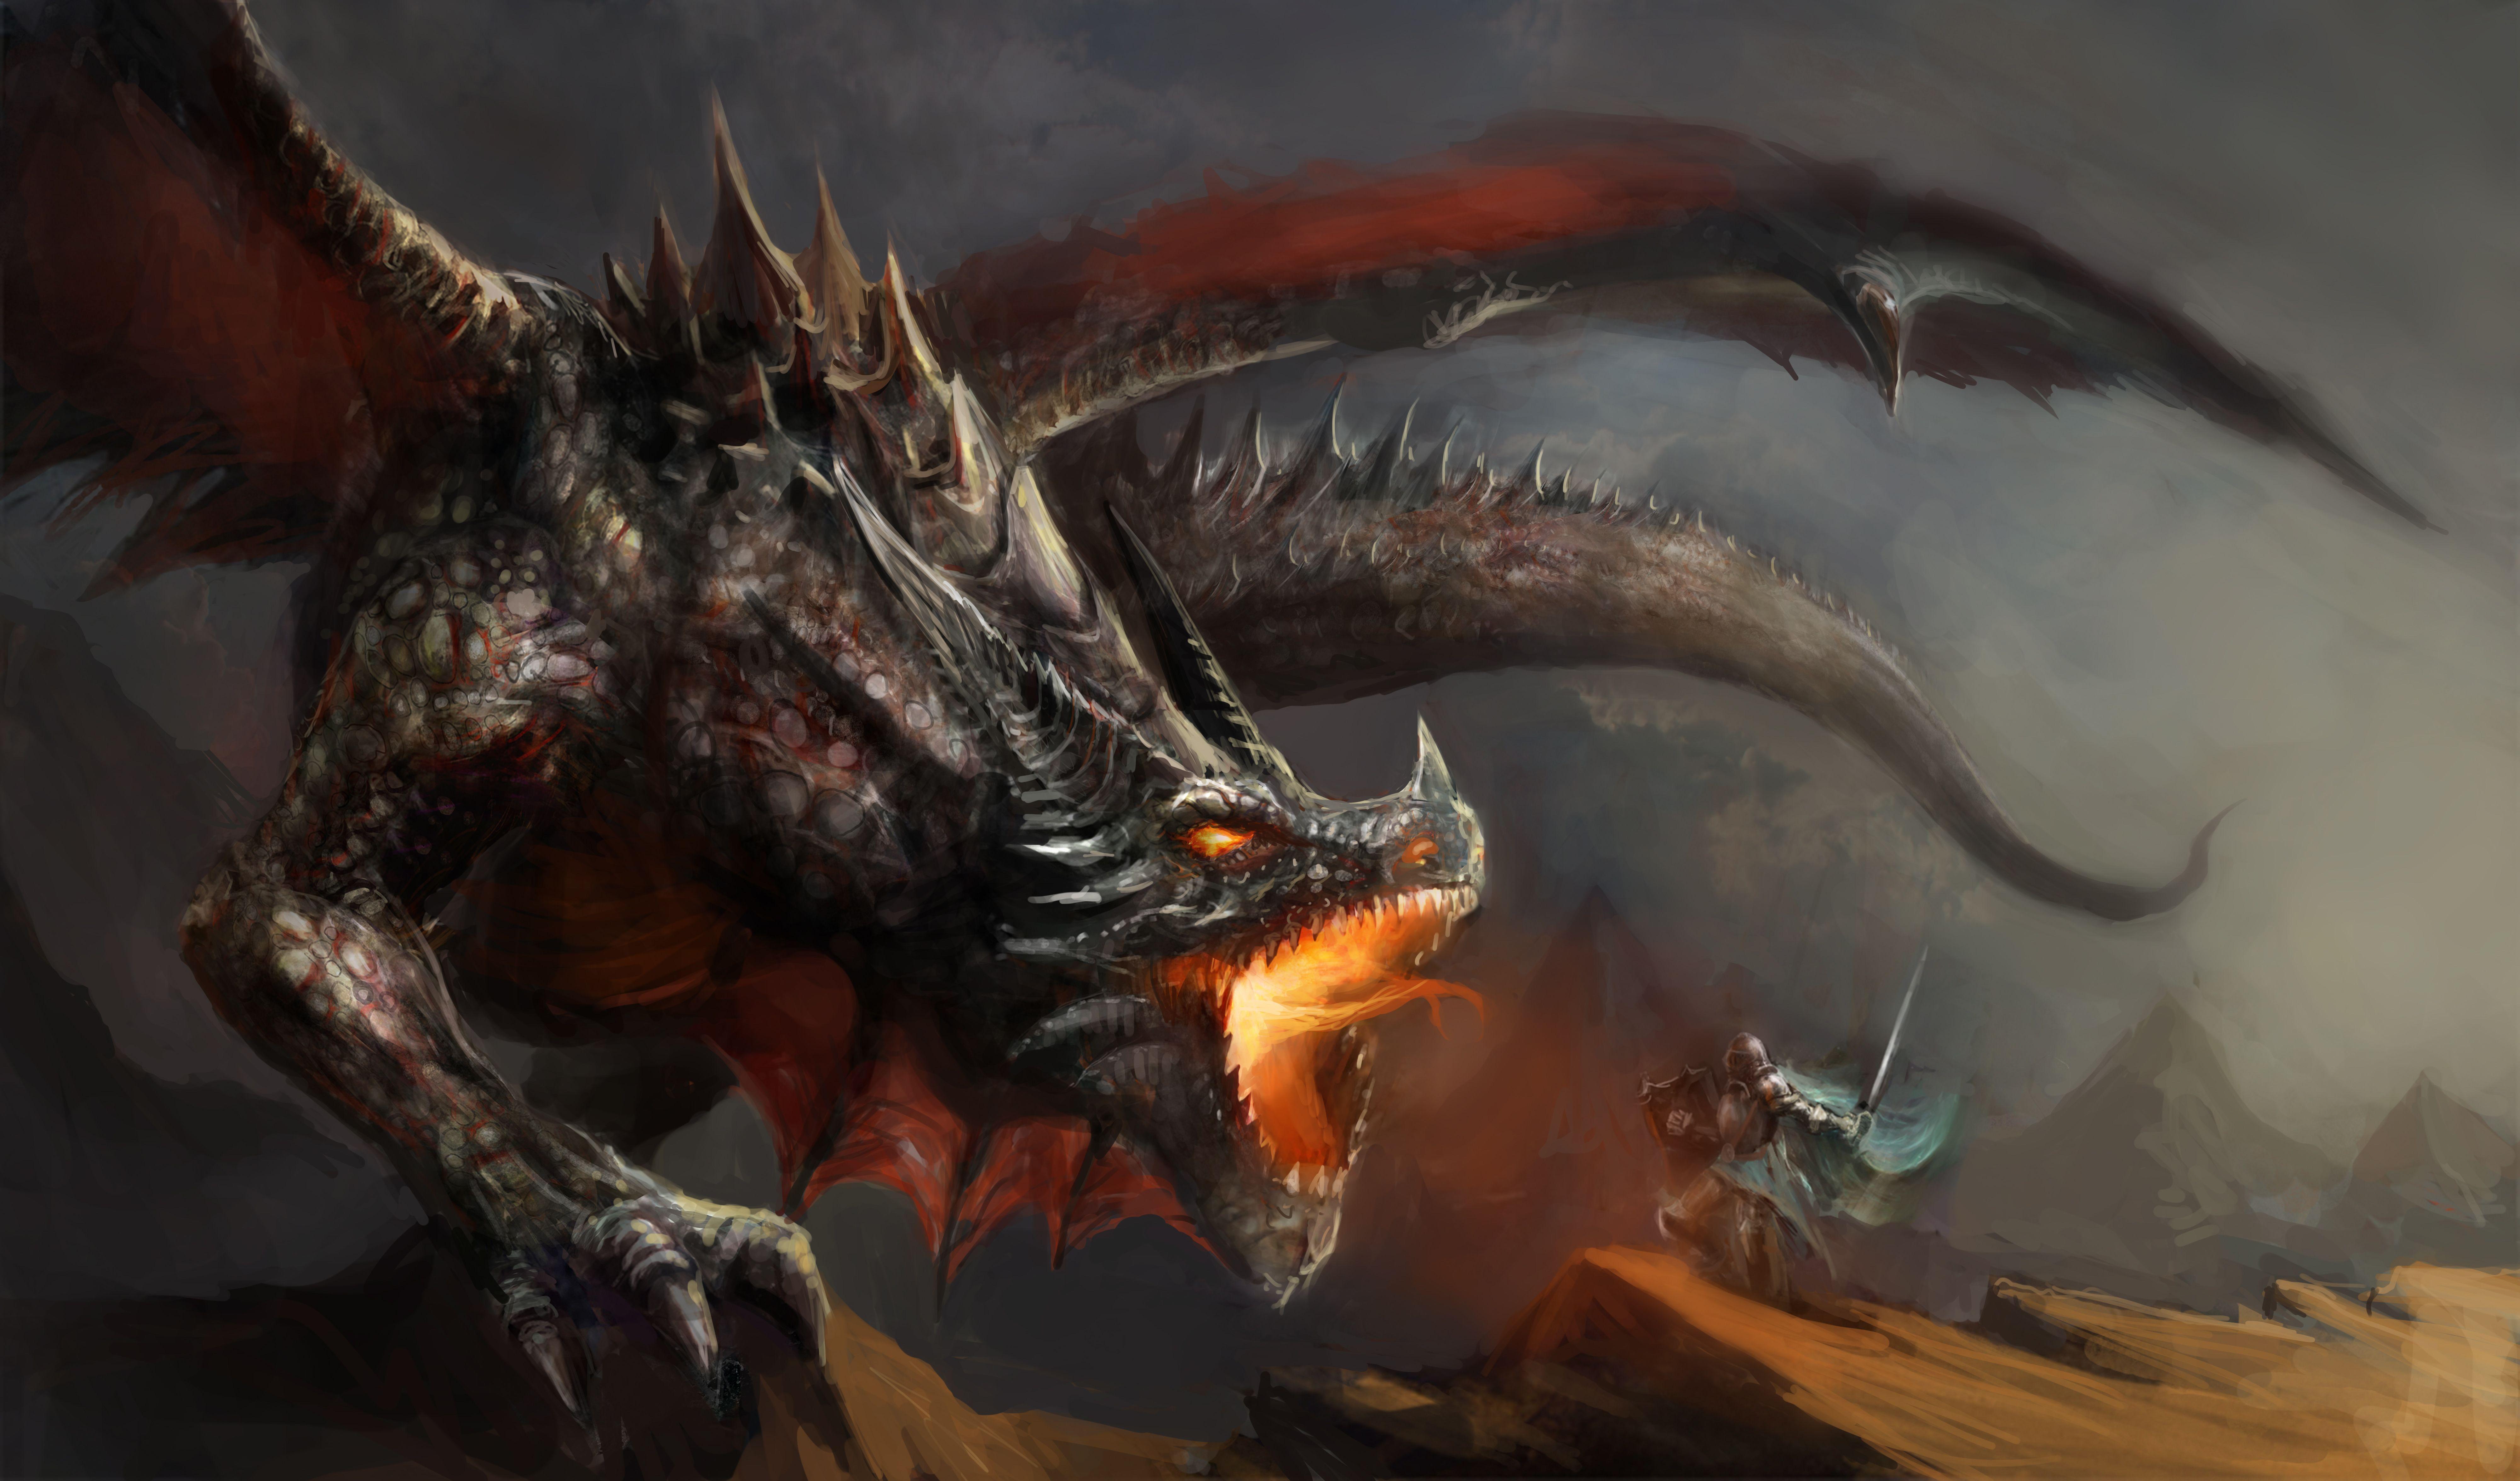 Pin by Brennan Johnson on D&D | Dragon, Mythological